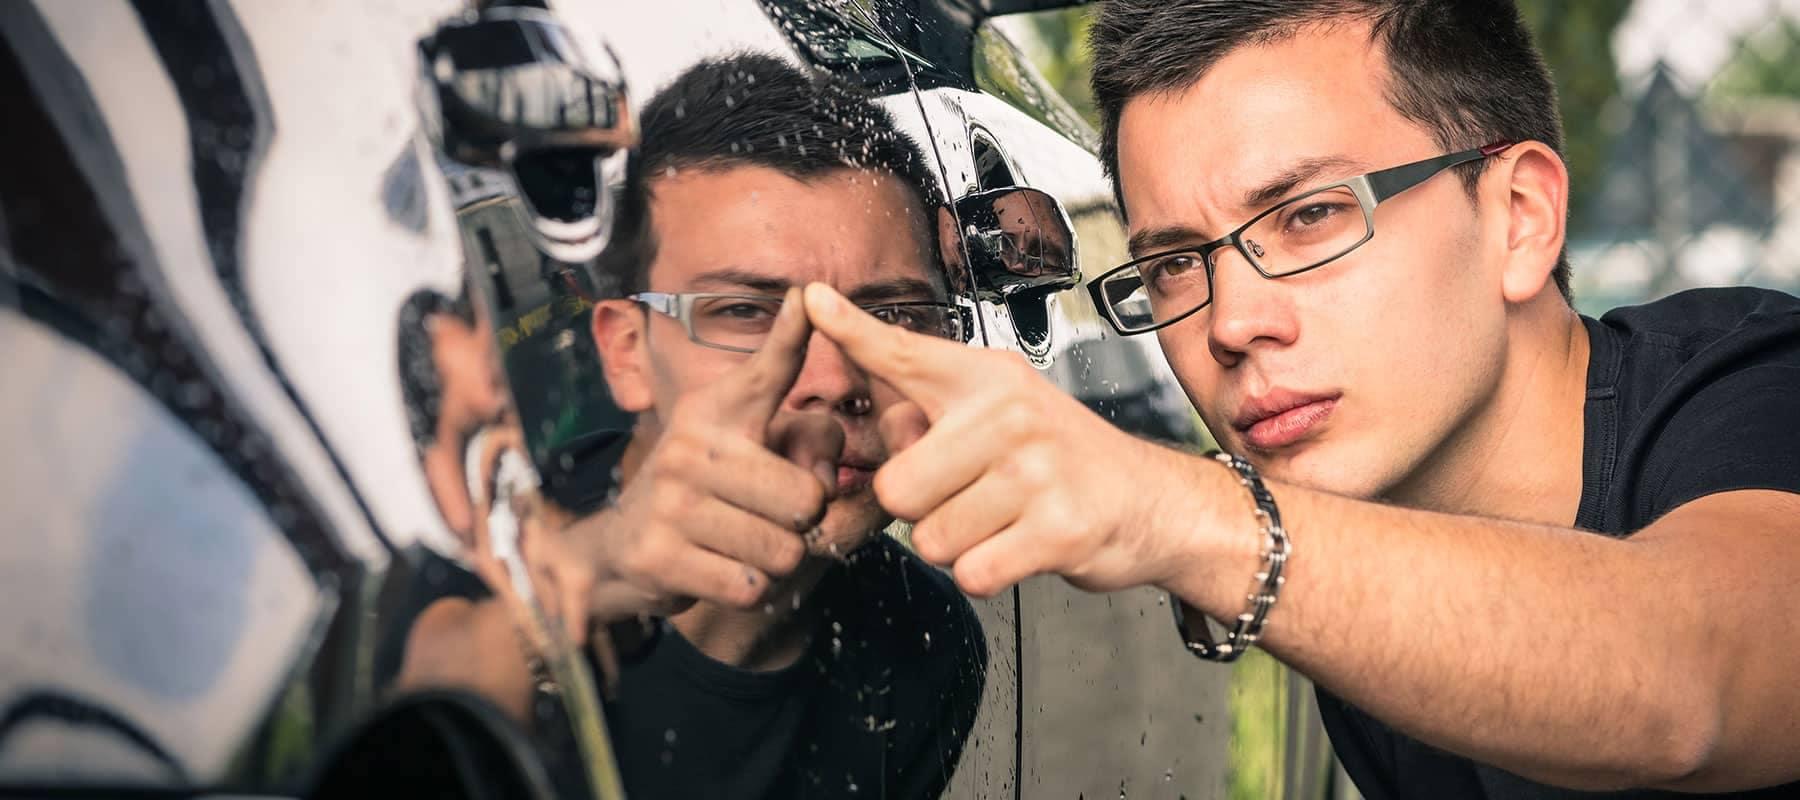 man wiping his fingure on super shiny car door